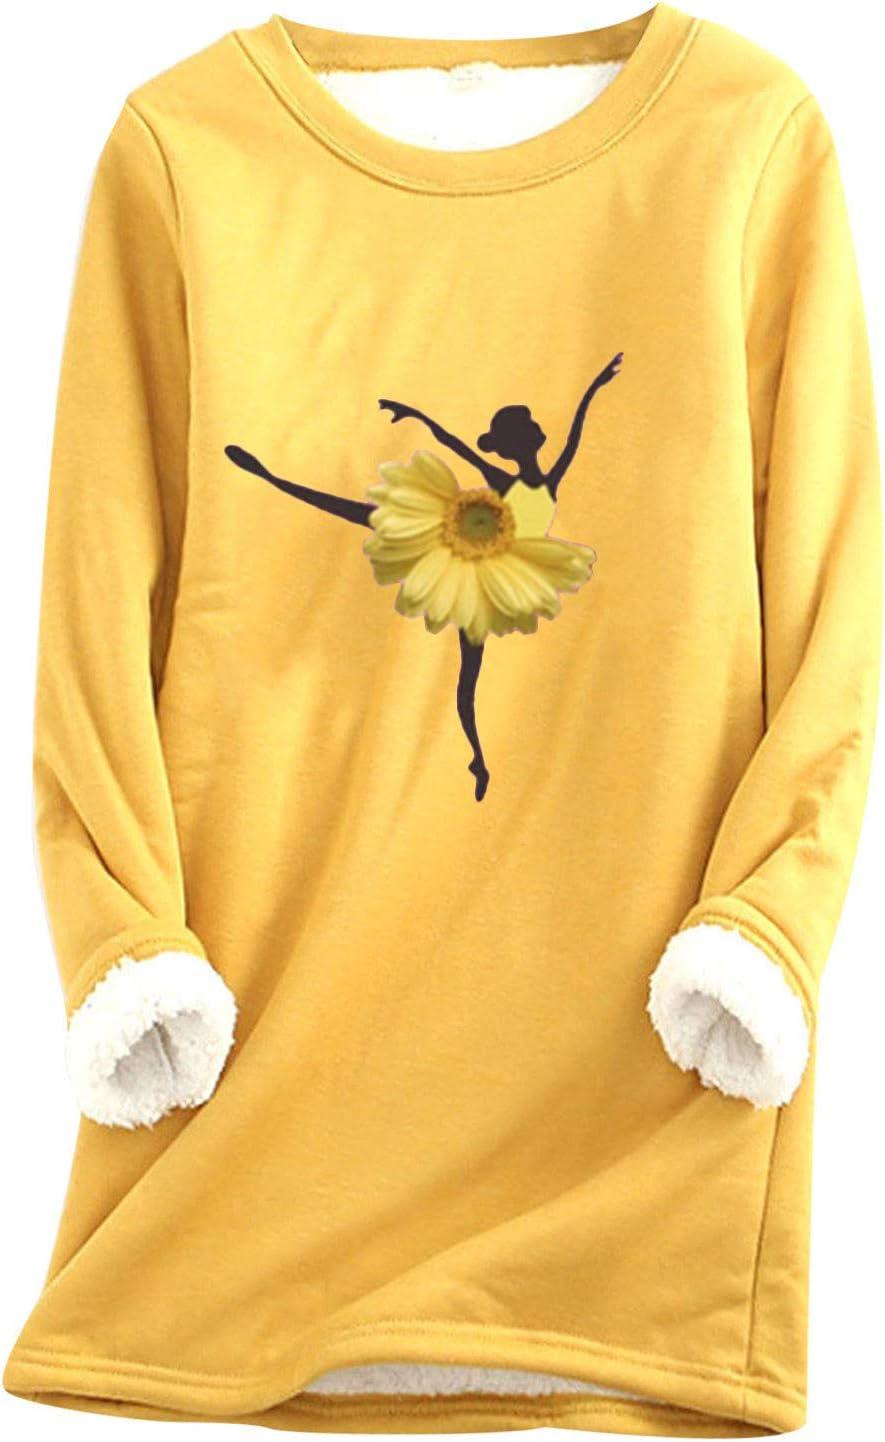 Sunflower Shirts 4 years warranty for Women Teen Girls Tops Tunic Gra Trendy Cute Classic